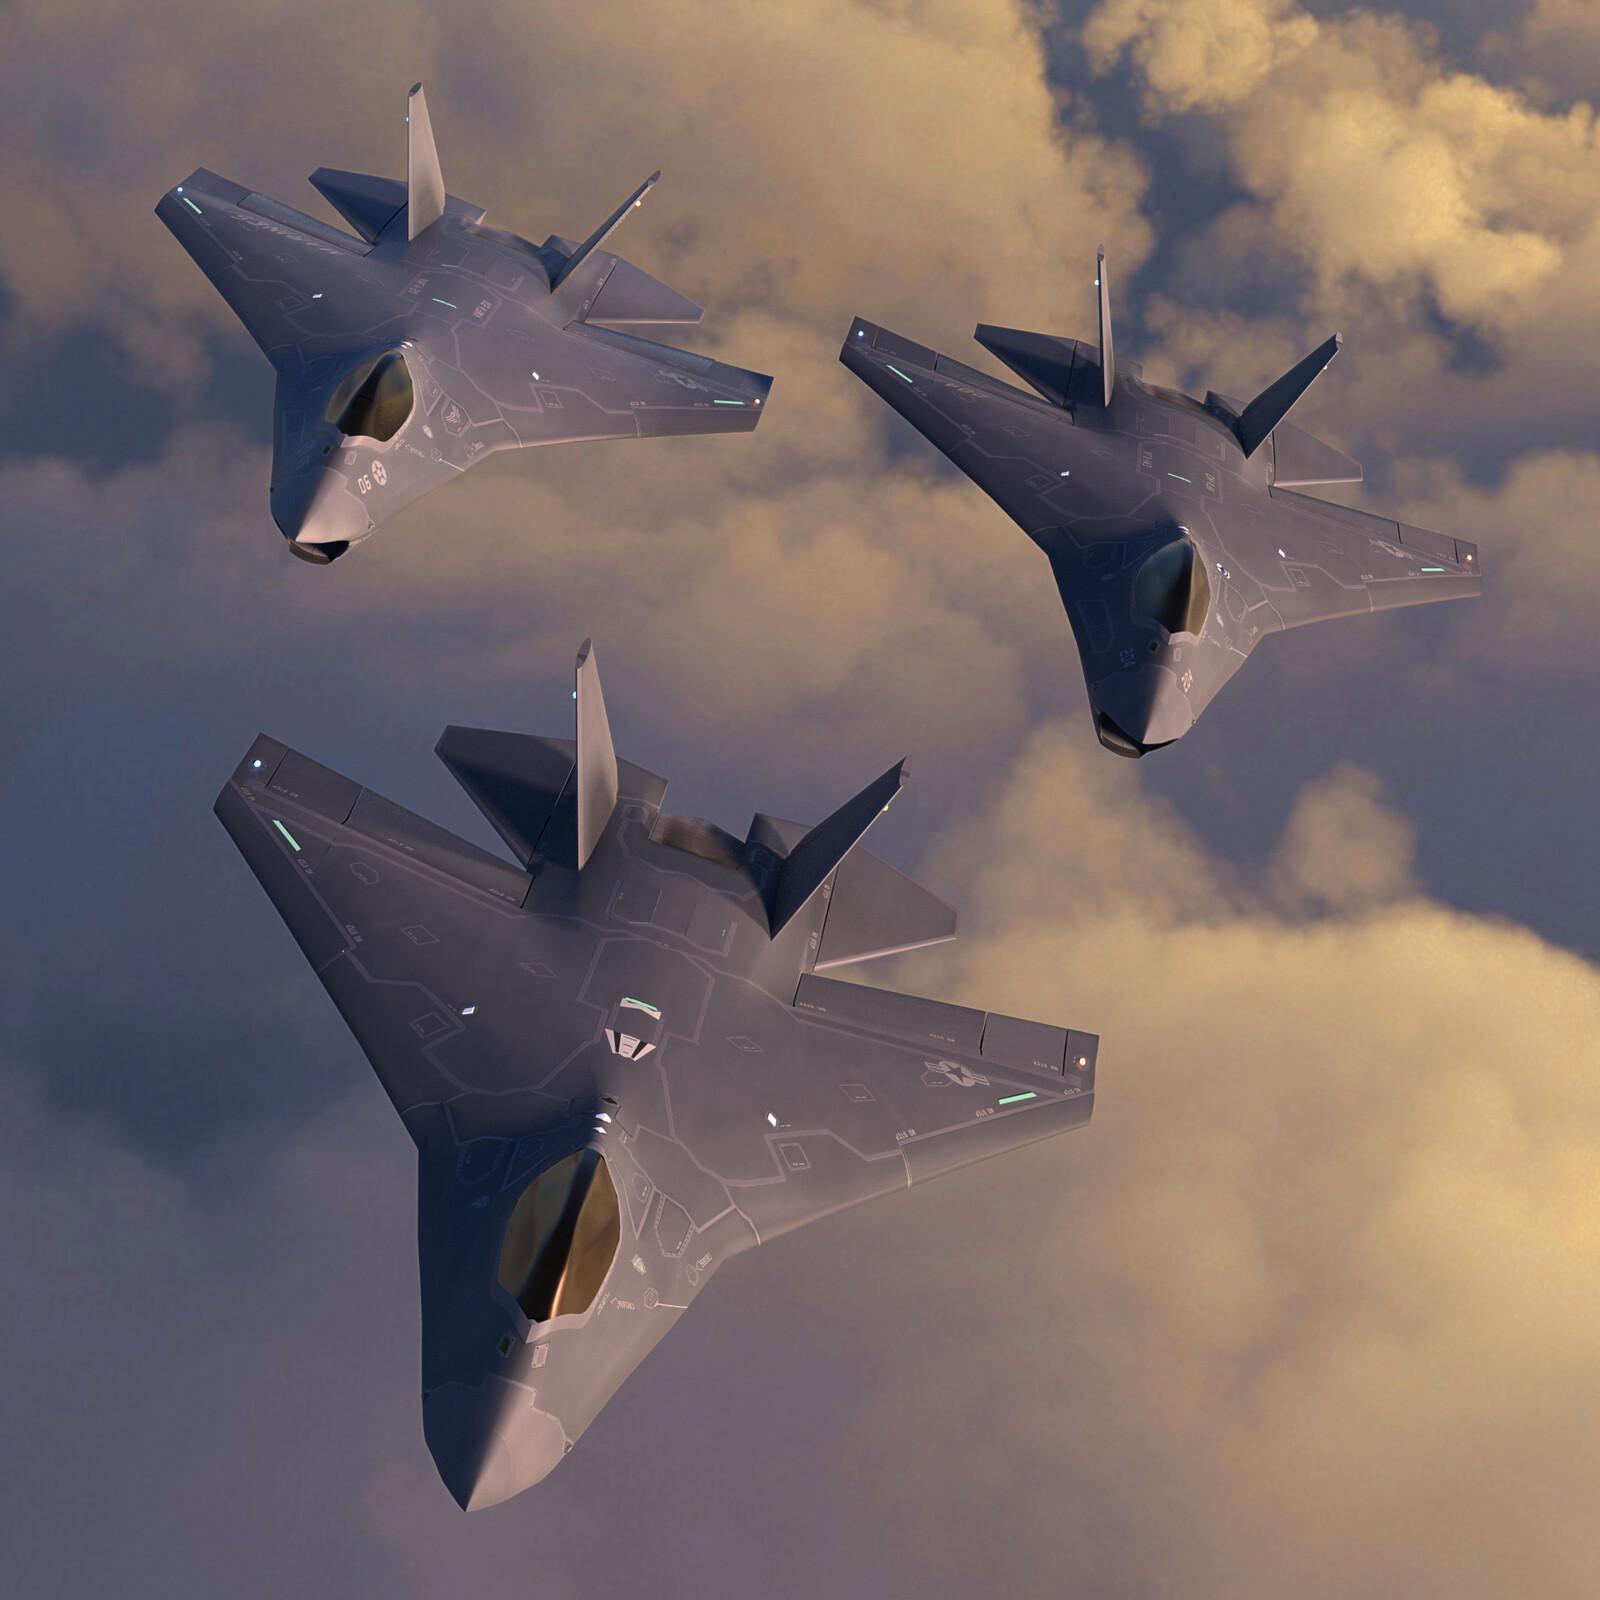 Lockheed Martin adjusts F-35 production schedules